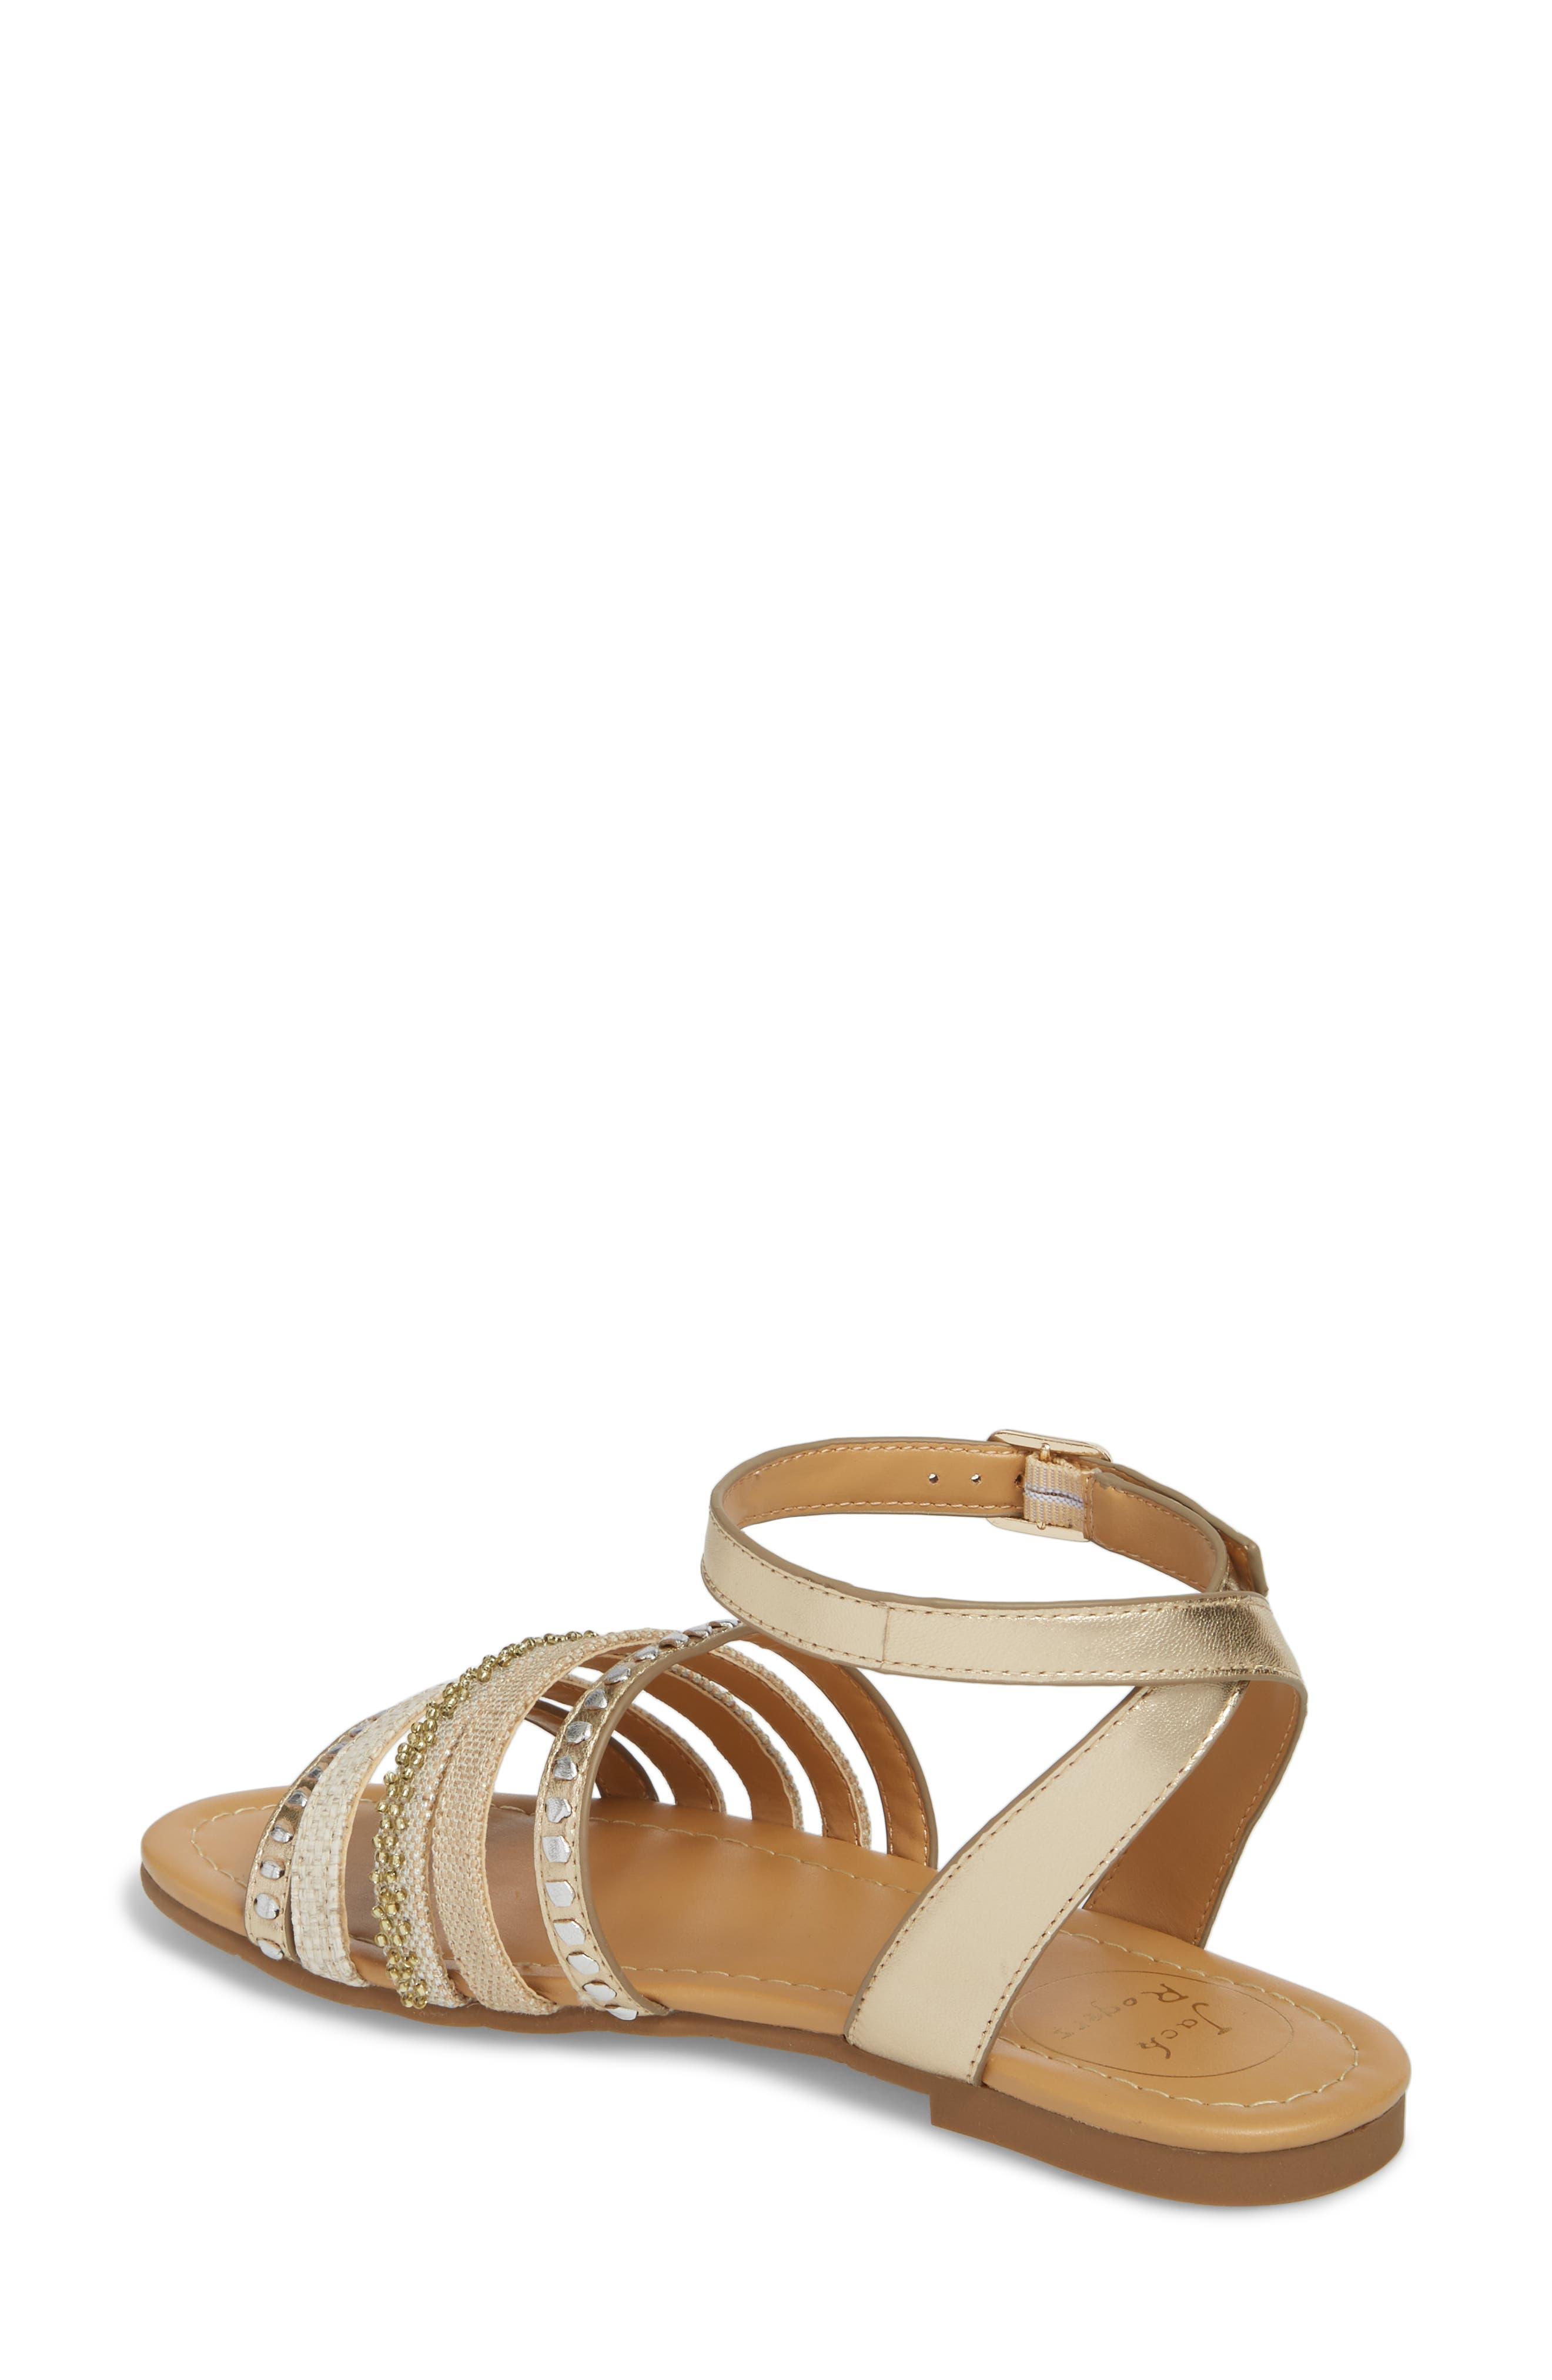 Hannah Braided Embellished Sandal,                             Alternate thumbnail 2, color,                             Platinum/ Silver Leather